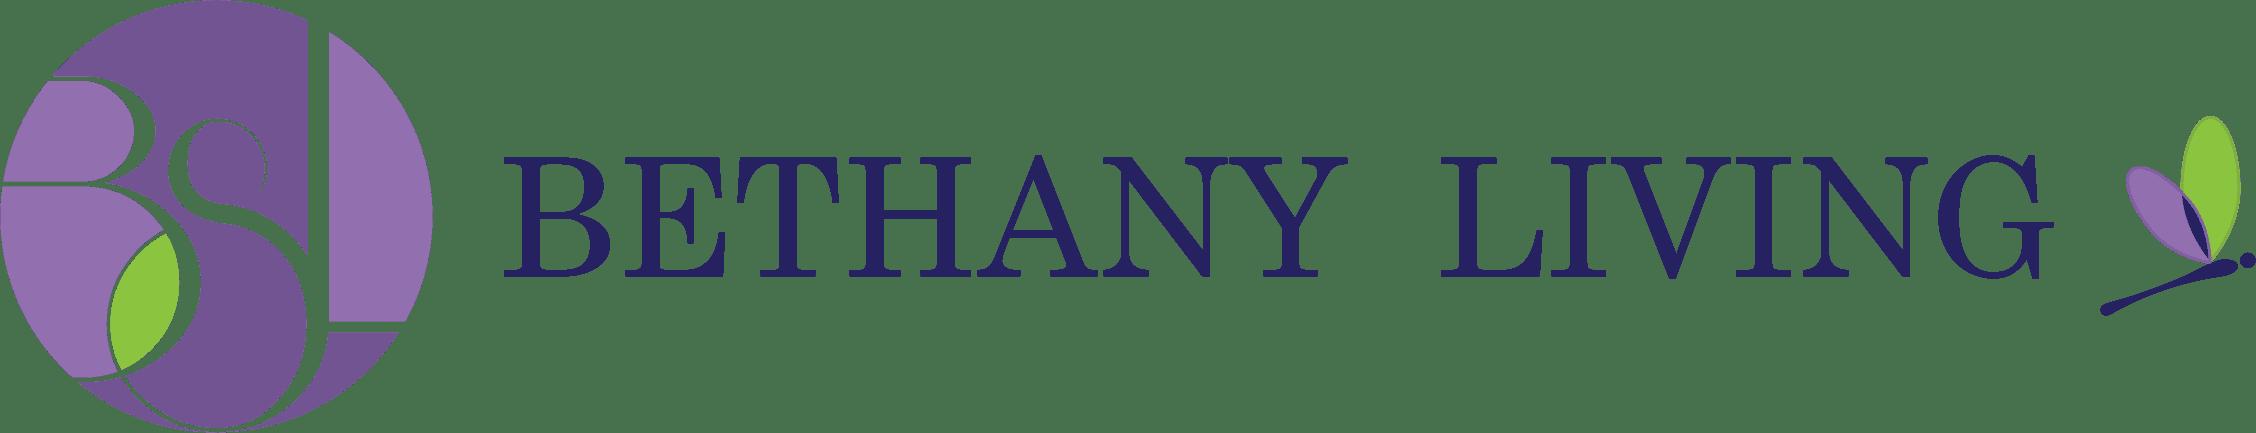 Bethany Living